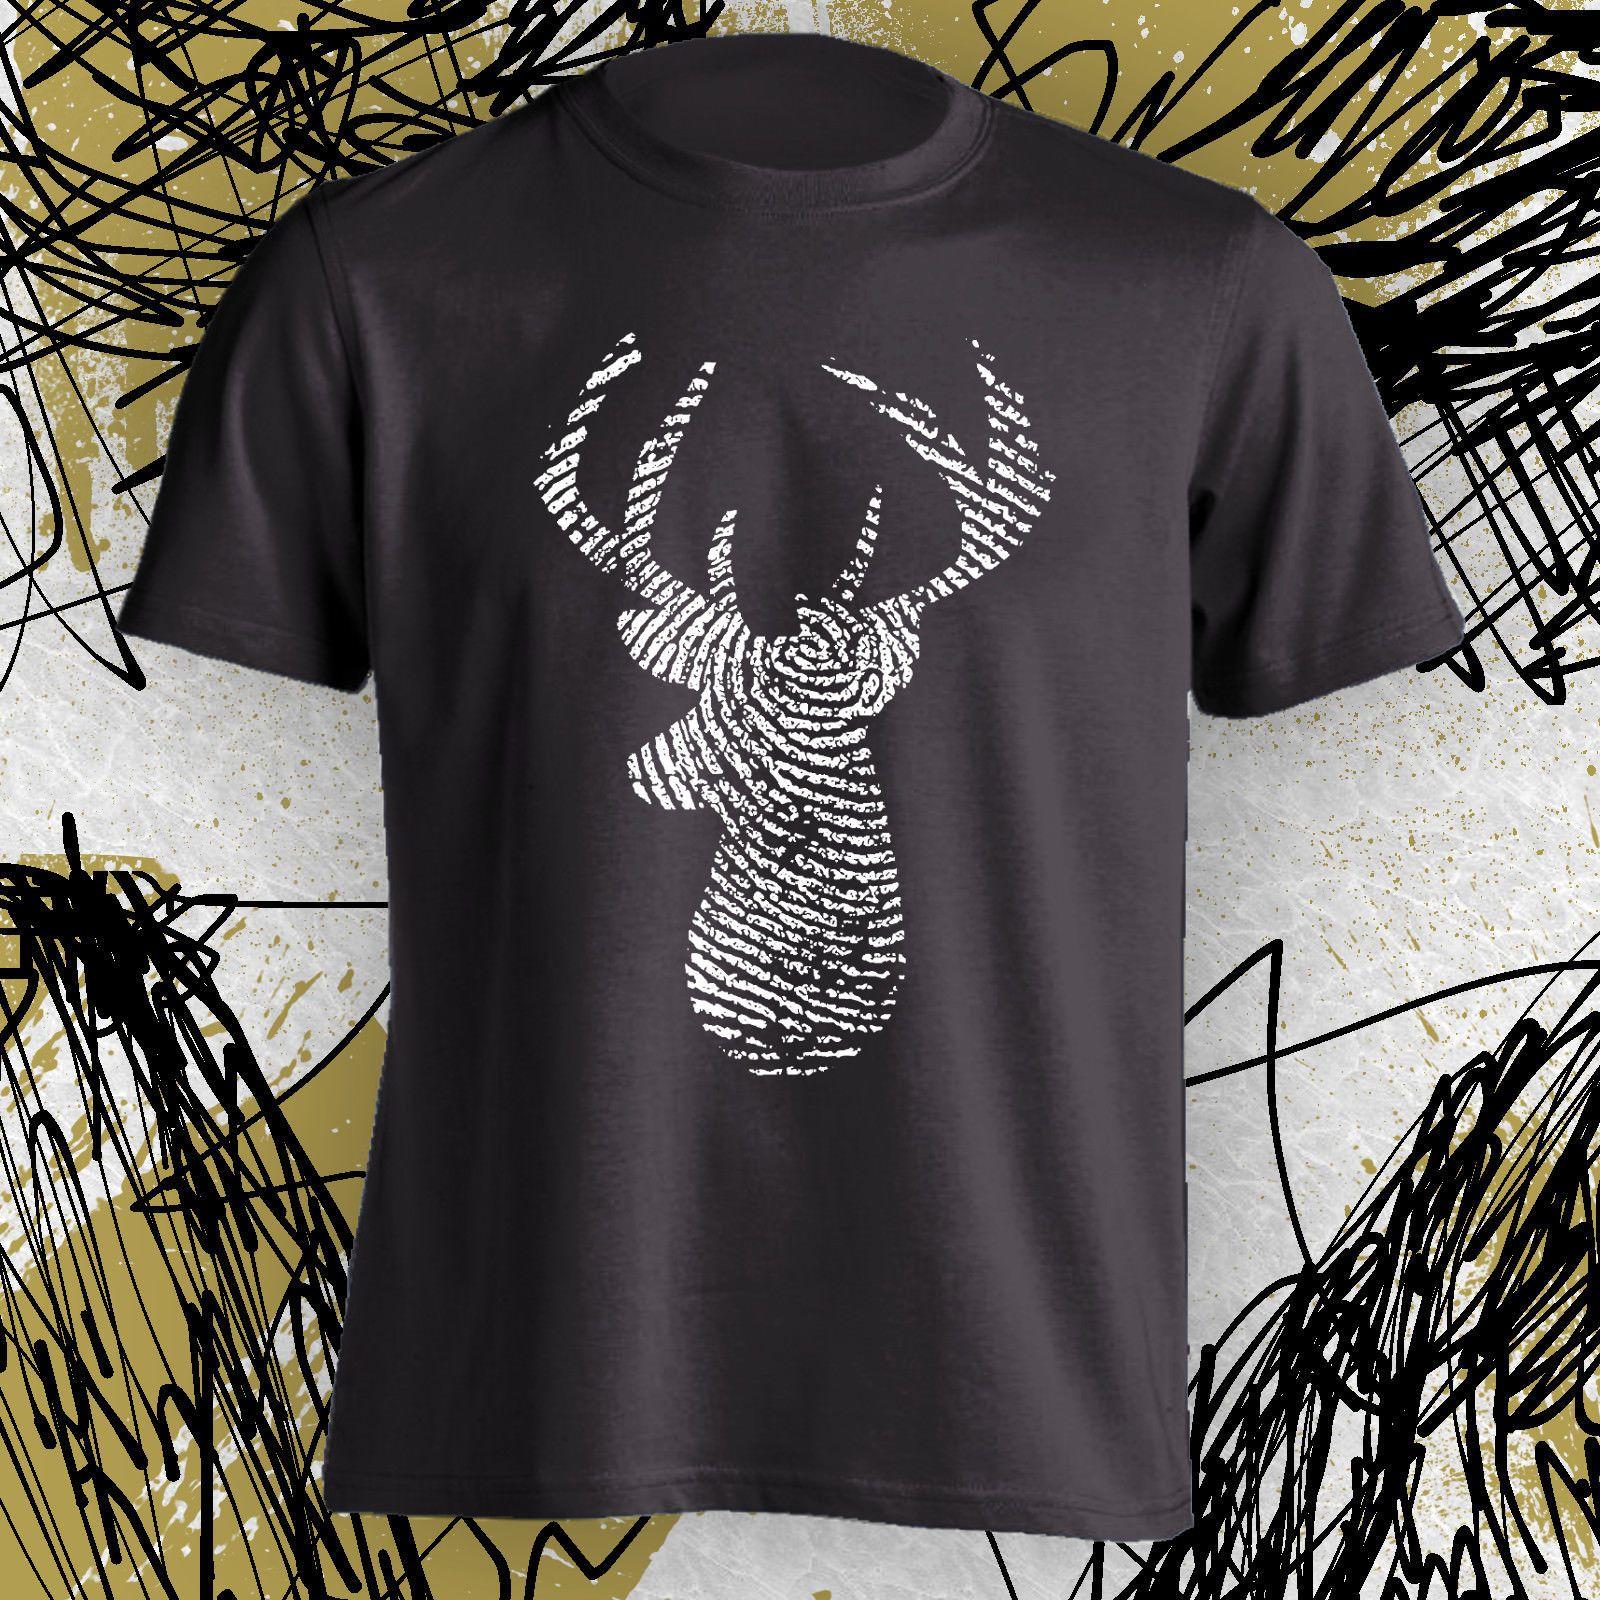 8e360bf4 Deer Hunter Shirt Buck Hunter DNA Fingerprint Hunt T Tee New S M L Xl Funny  Unisex Casual Tshirt Top Shirt Designer Customised T Shirts From  Happyjapanuk, ...